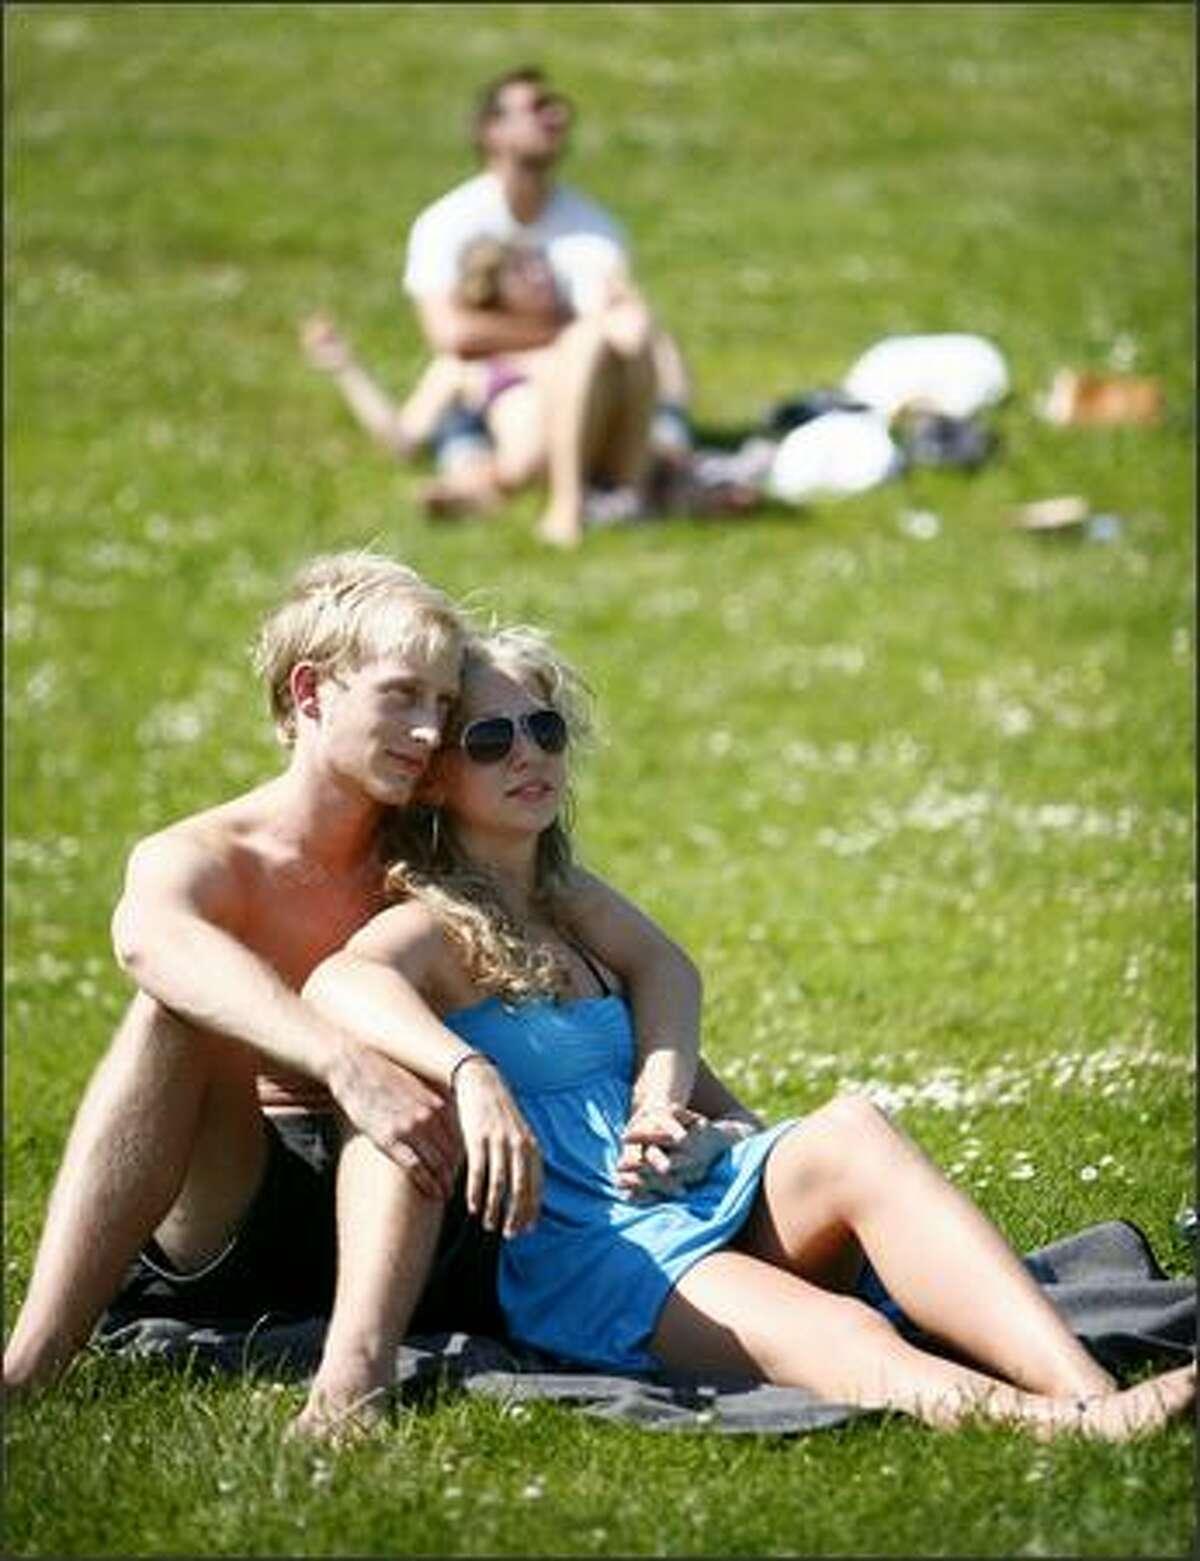 University of Washington students Bryant Sutton and Julie Kink enjoy the sun at Gas Works Park on Thursday.